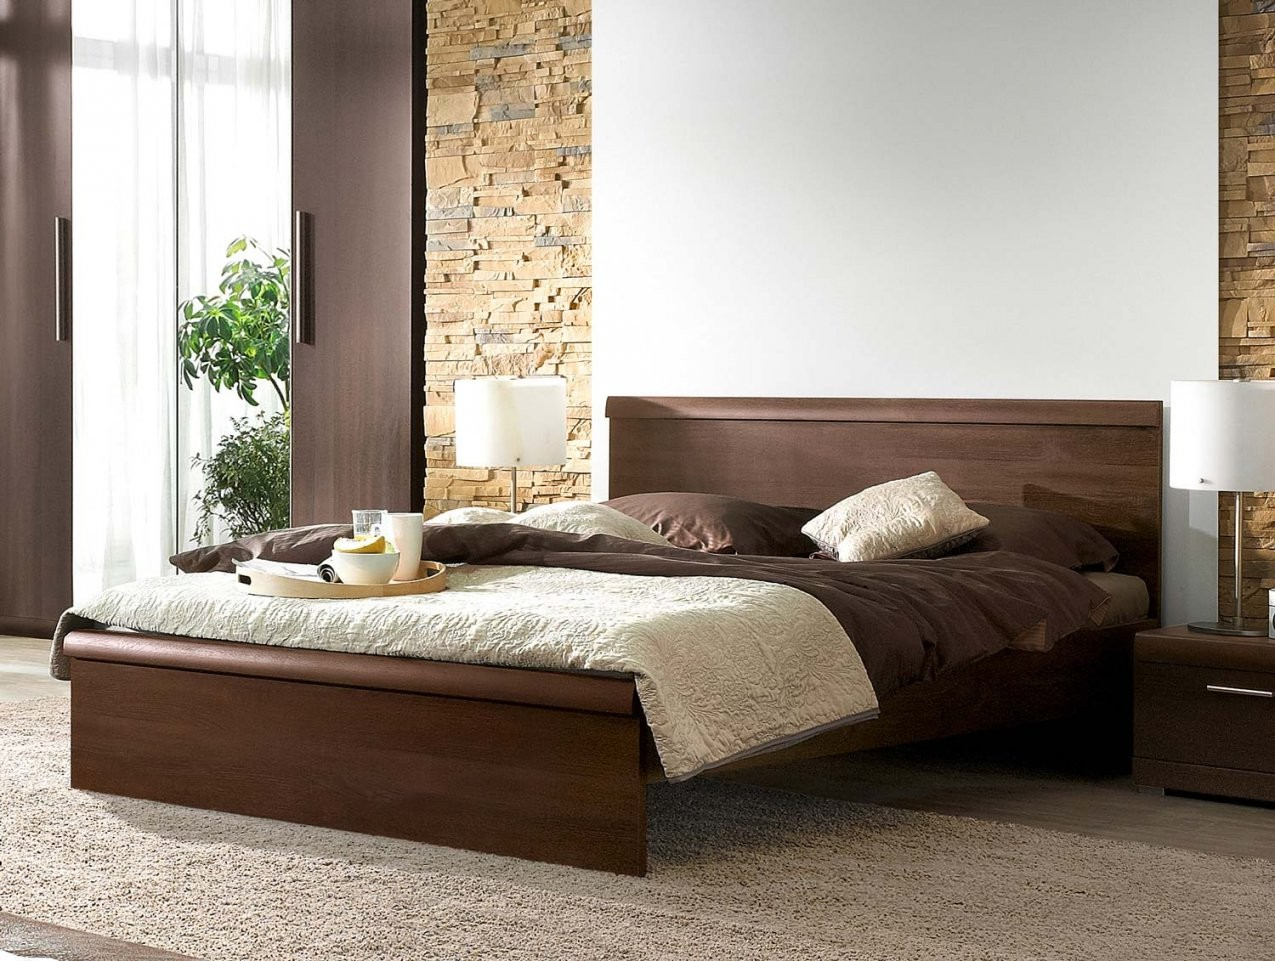 Bett Doppelbett 160X200Cm Sonoma Eiche Dunkel Neu  Holzbetten von Bett Sonoma Eiche 160X200 Bild